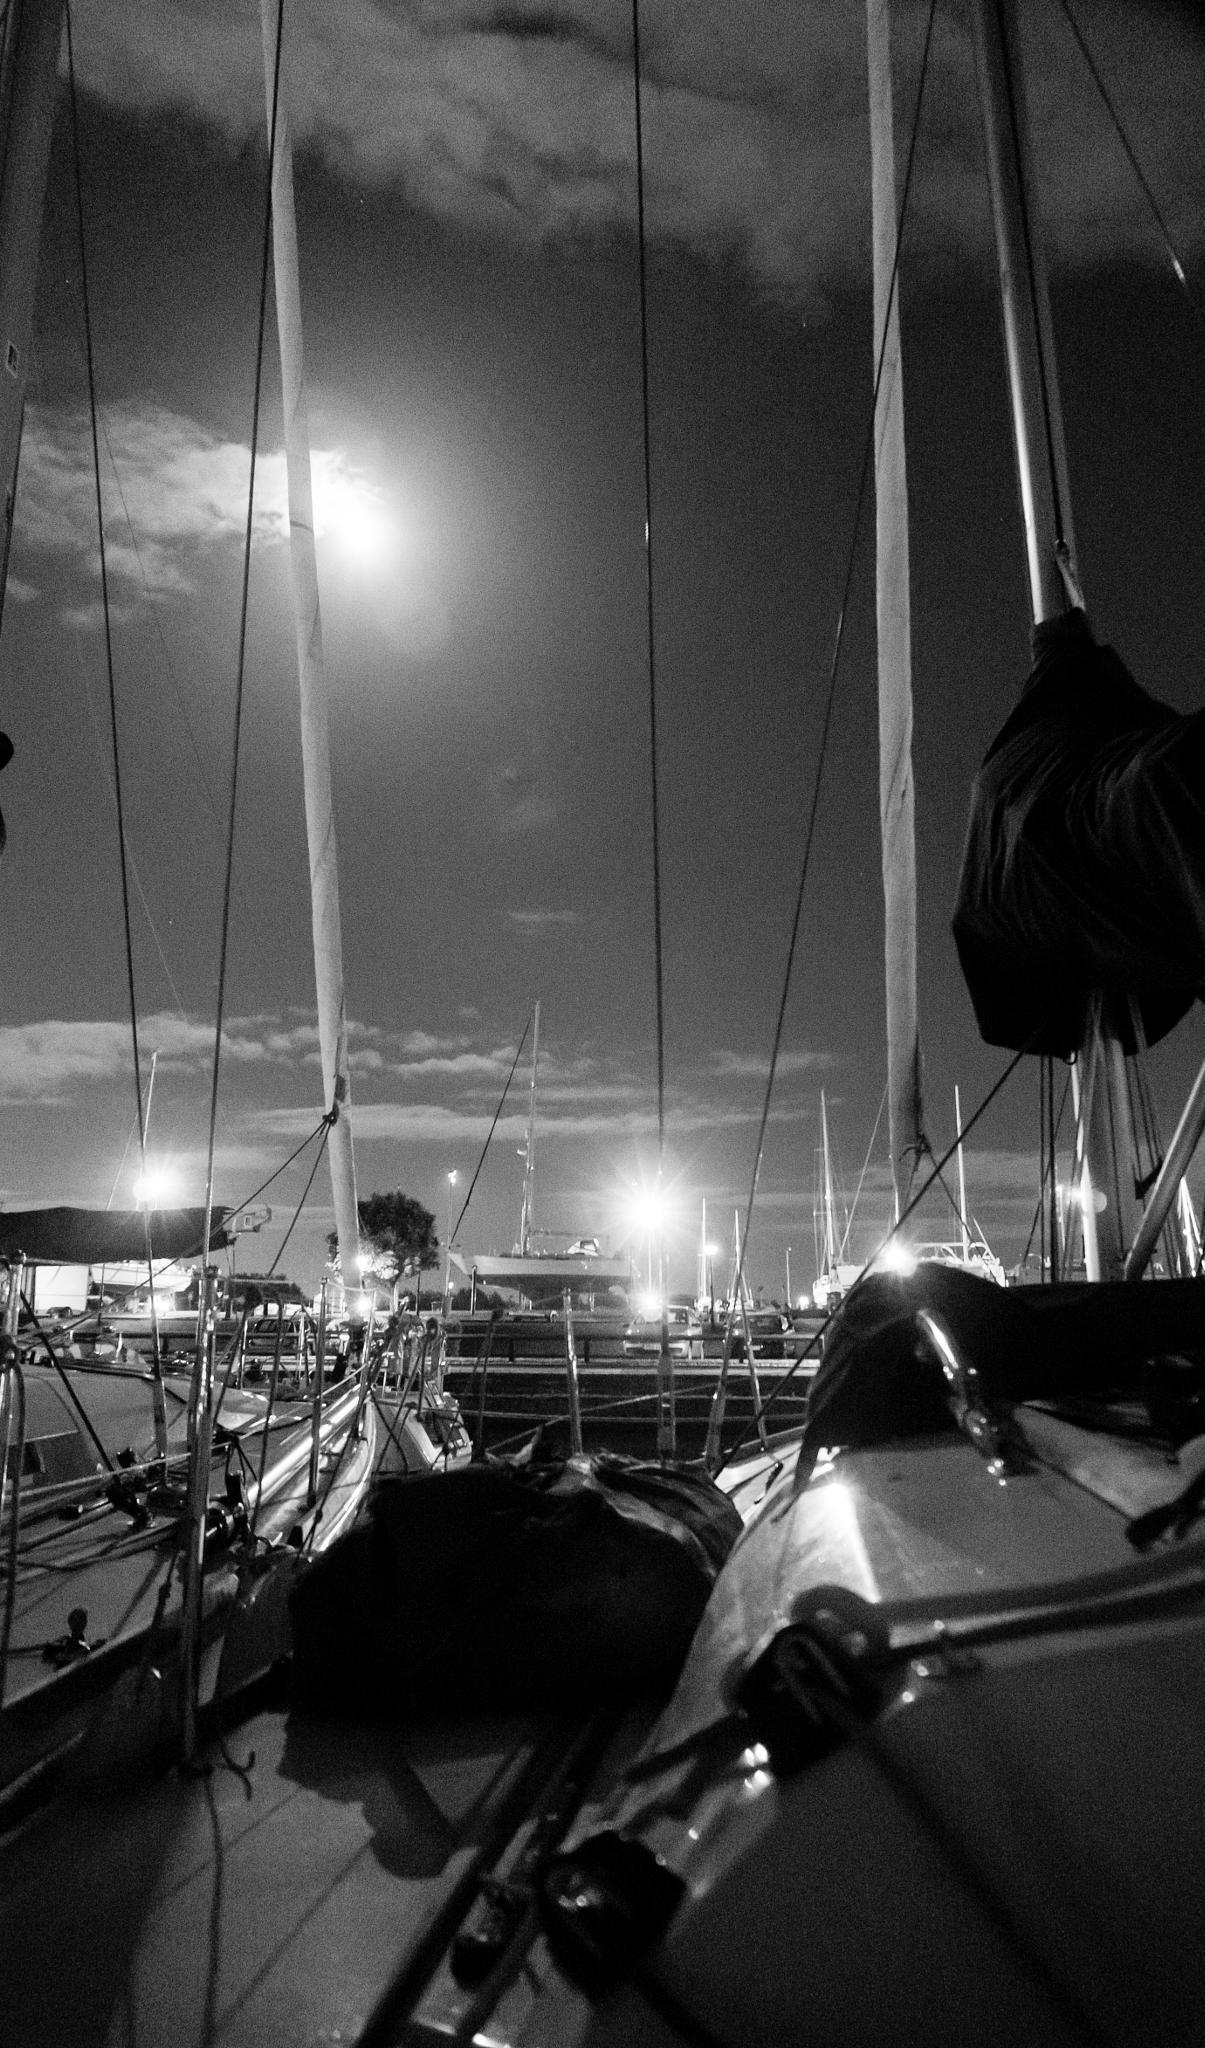 Boats at rest by Steve Garratt